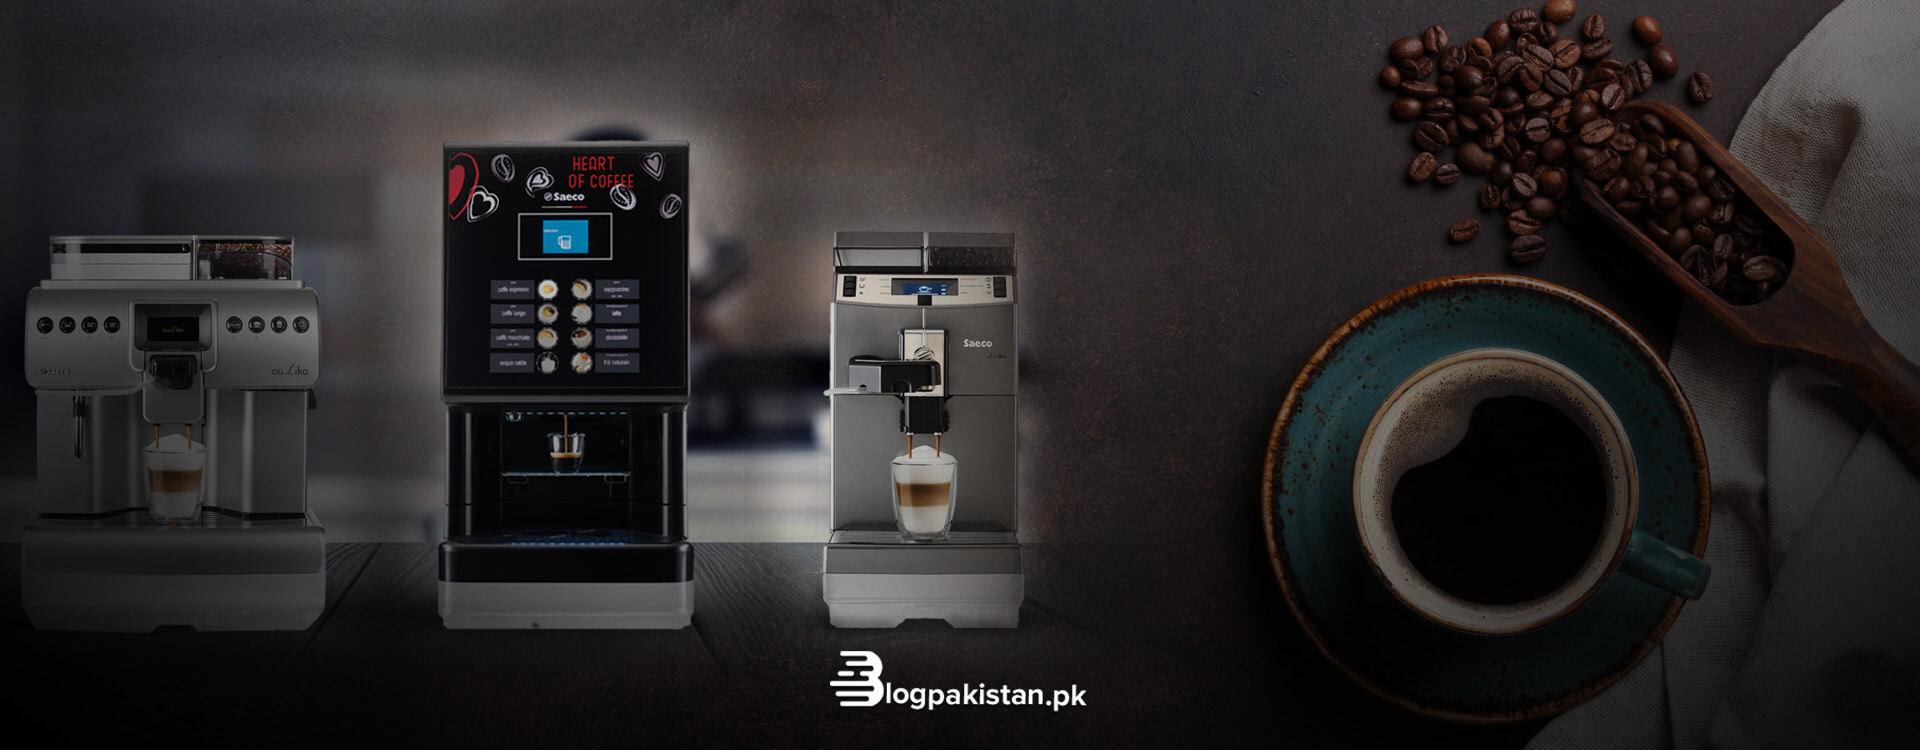 Best coffee machine, coffee machine price in Pakistan, best coffee machines in Pakistan.